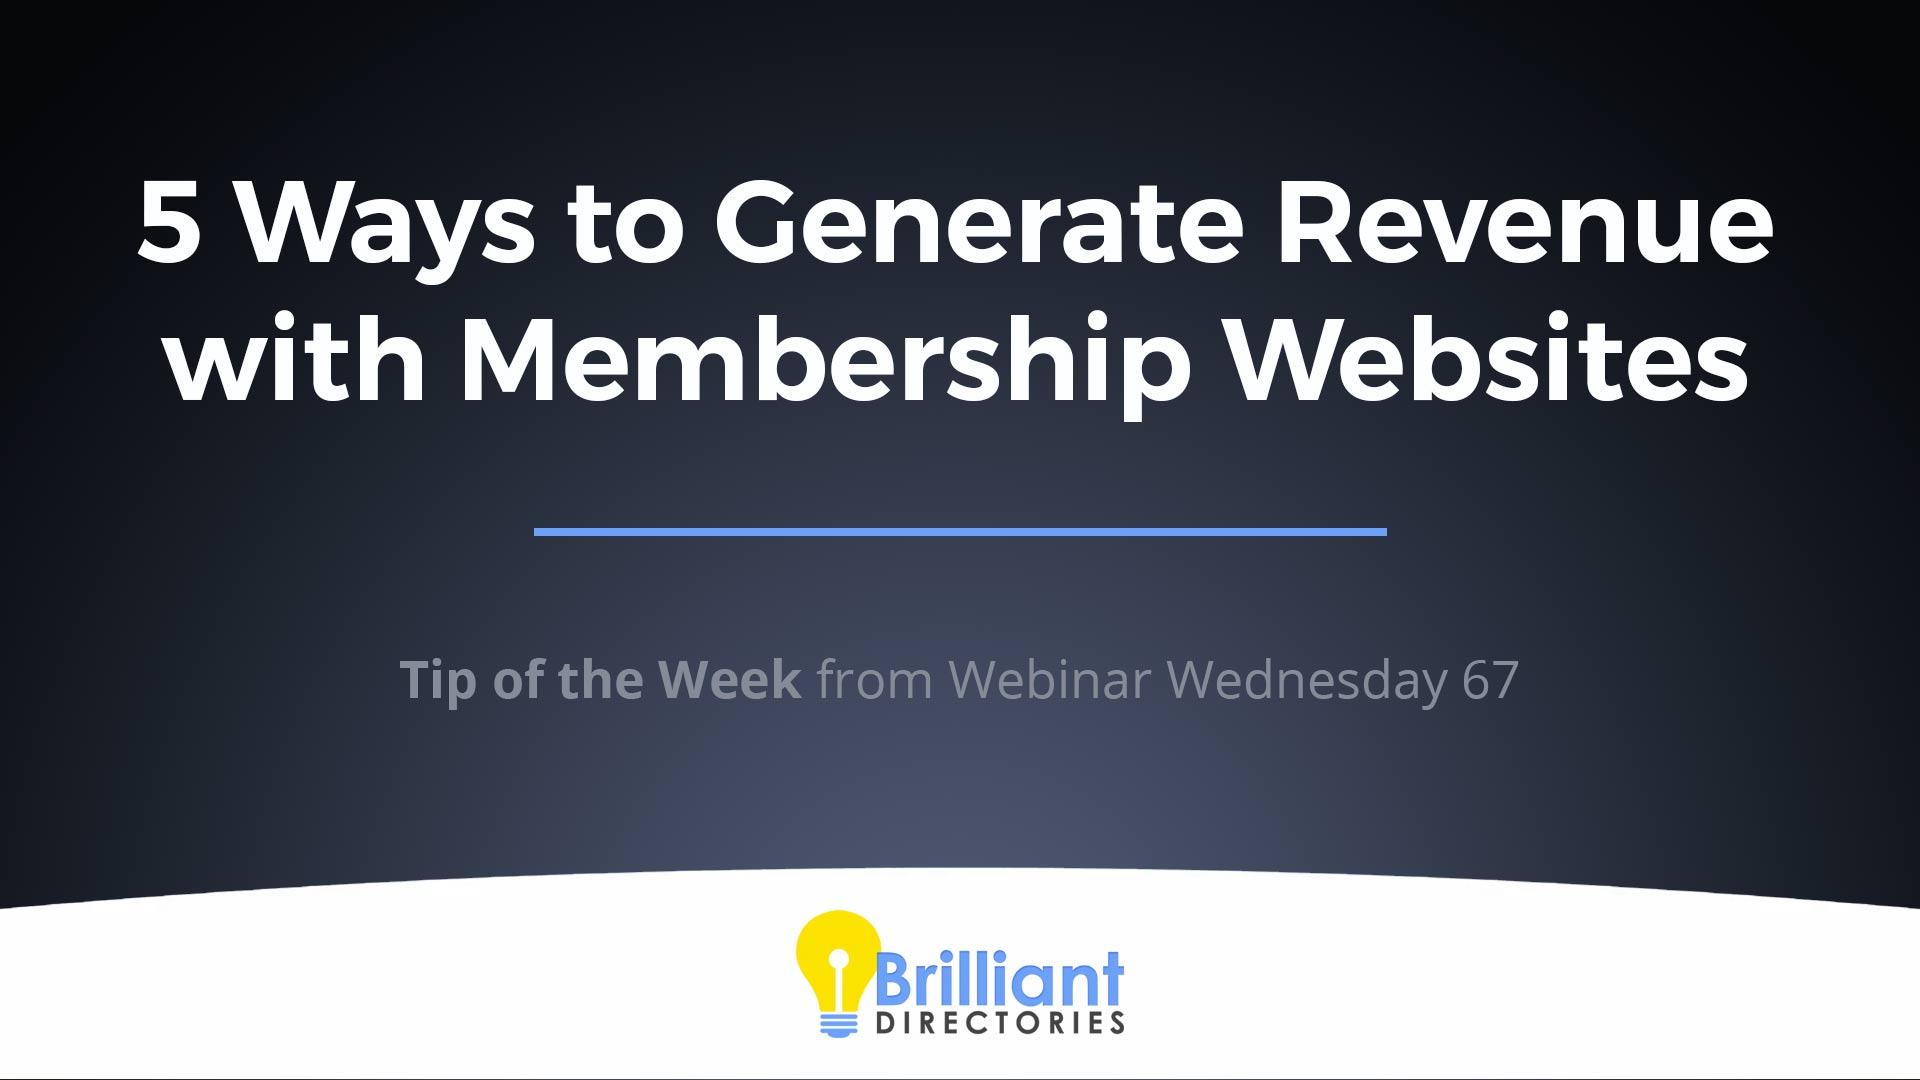 https://www.brilliantdirectories.com/blog/5-easy-ways-to-generate-revenue-with-membership-websites